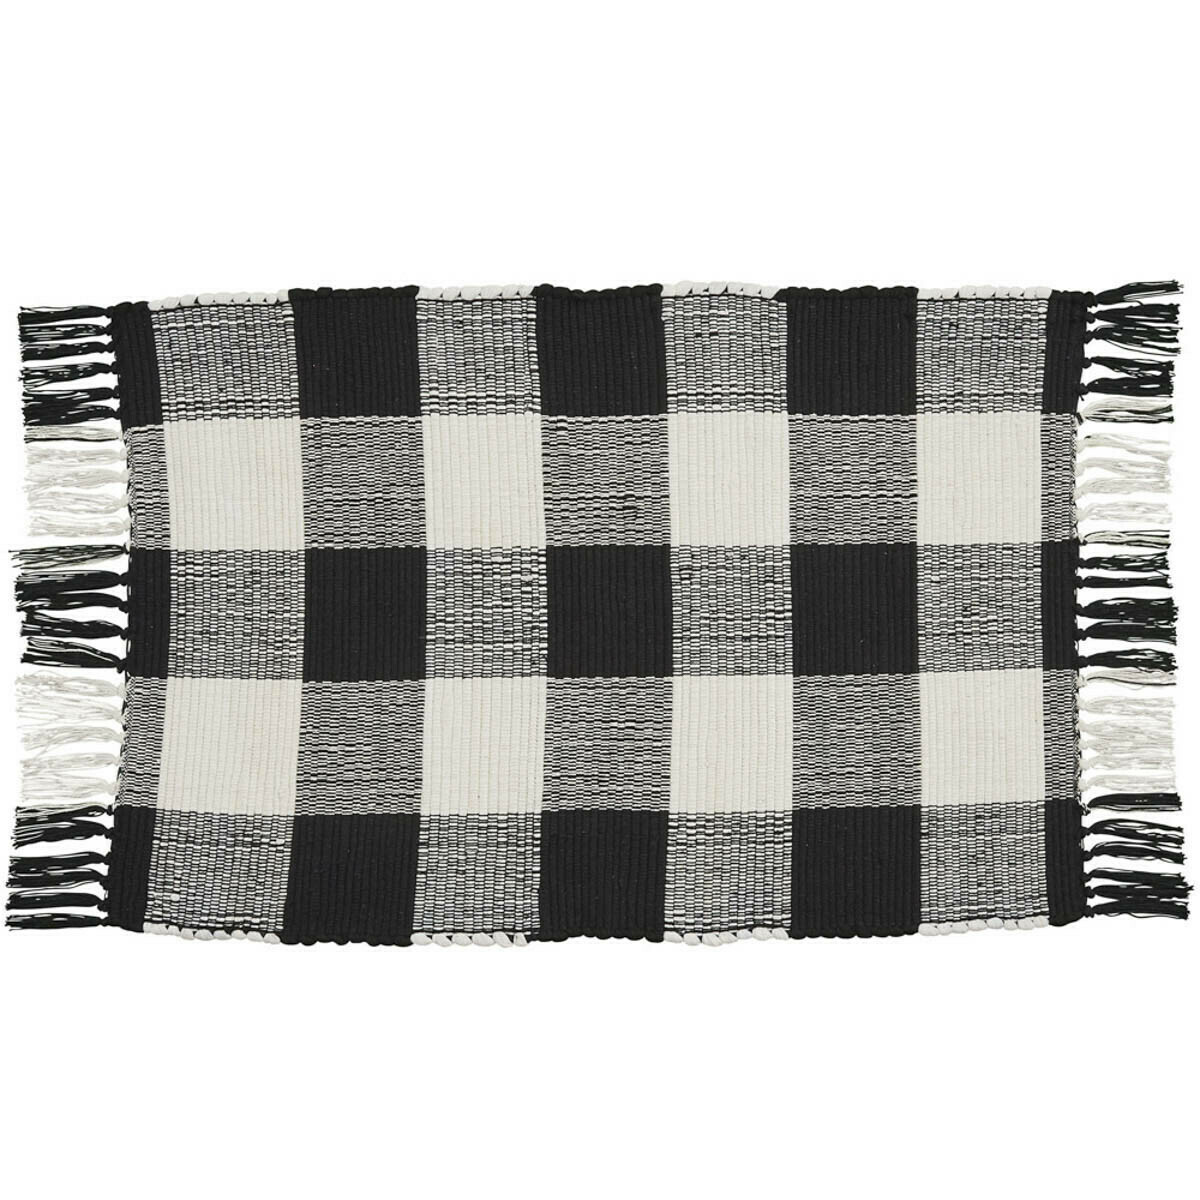 Wicklow Check Black & Cream 2'X3' Rag Rug